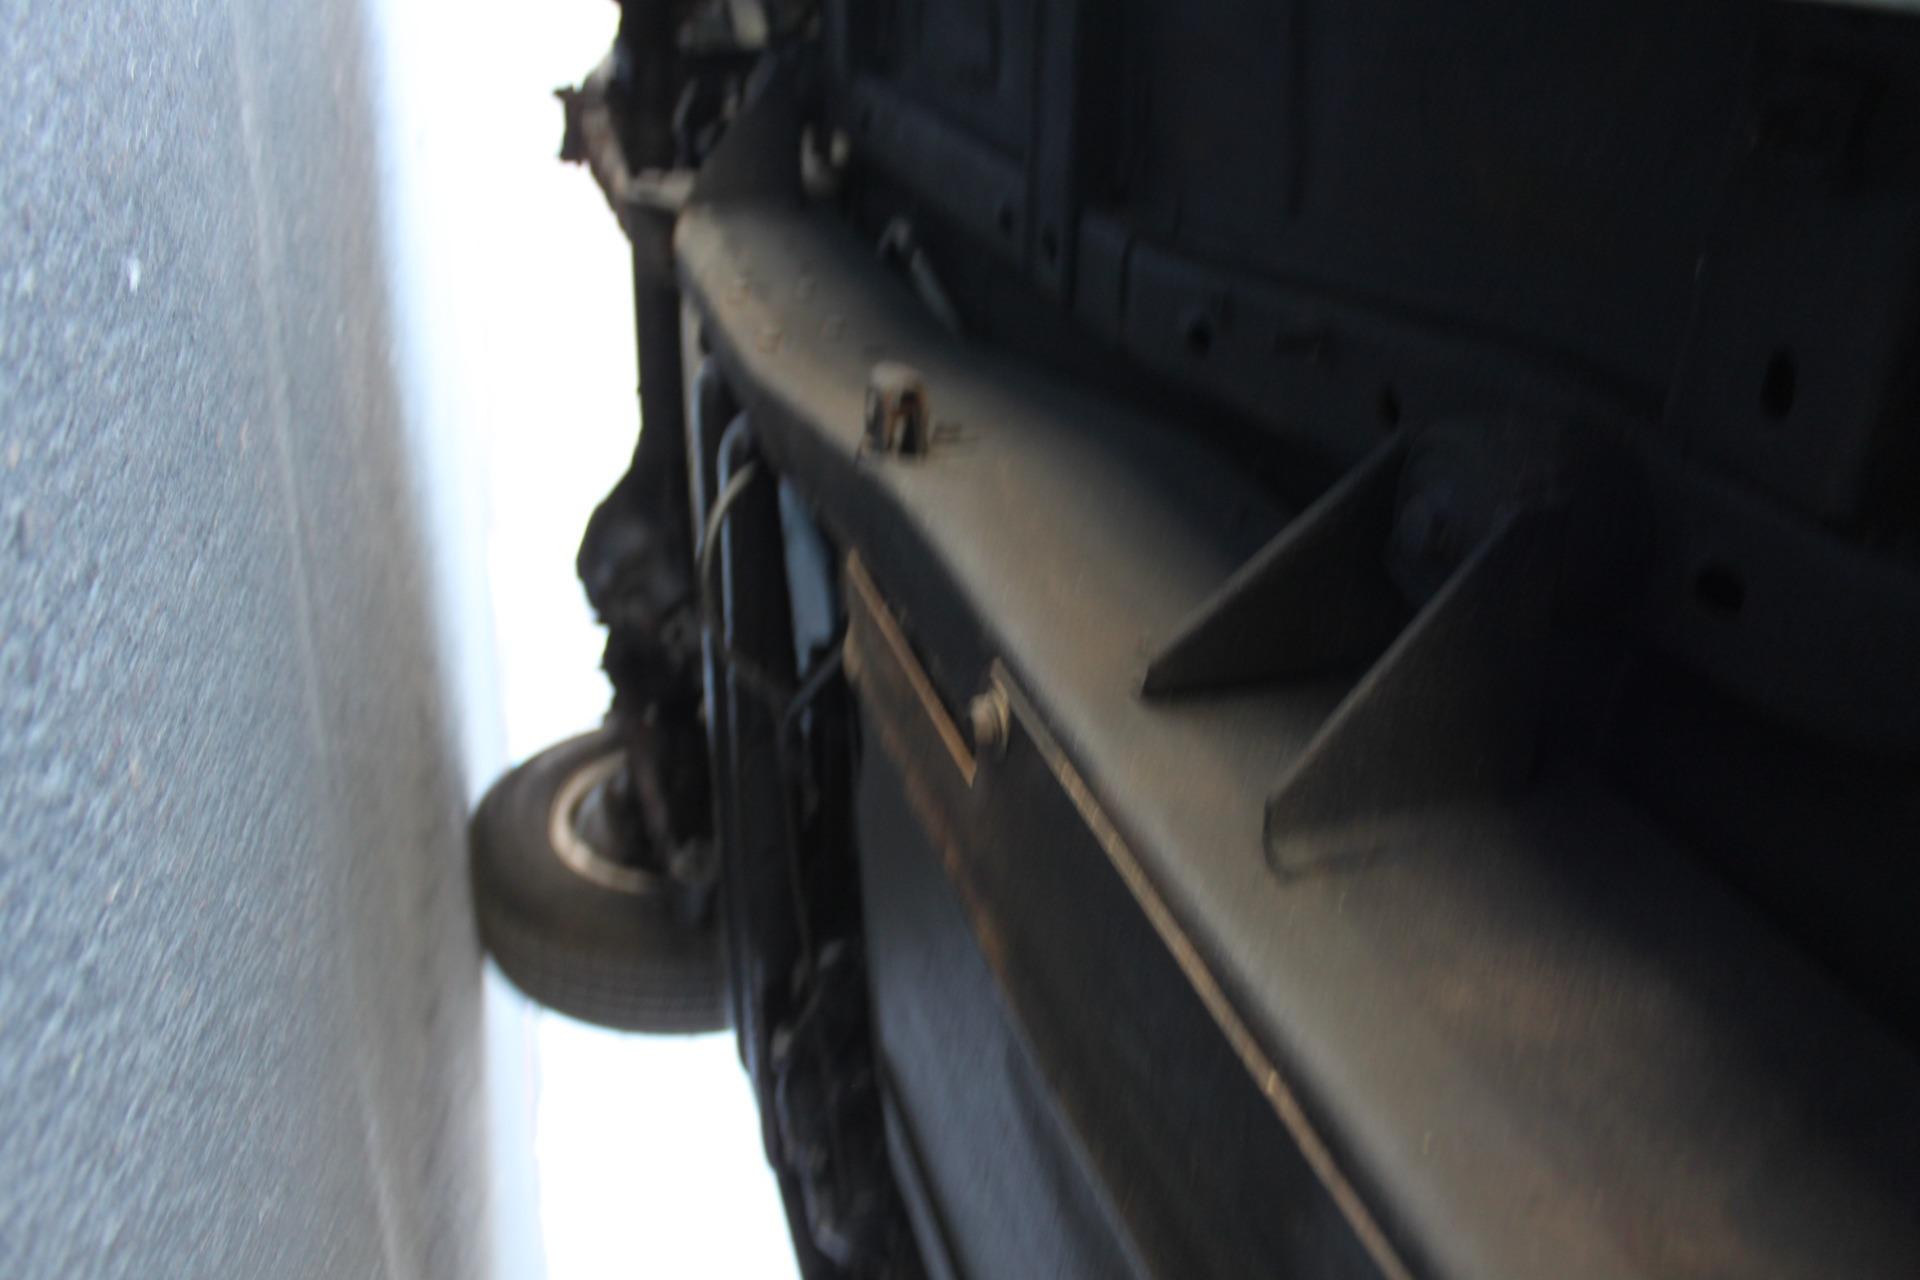 Used-1977-Jeep-Wagoneer-Custom-Fuel-Injected-66-Liter-401-Grand-Wagoneer